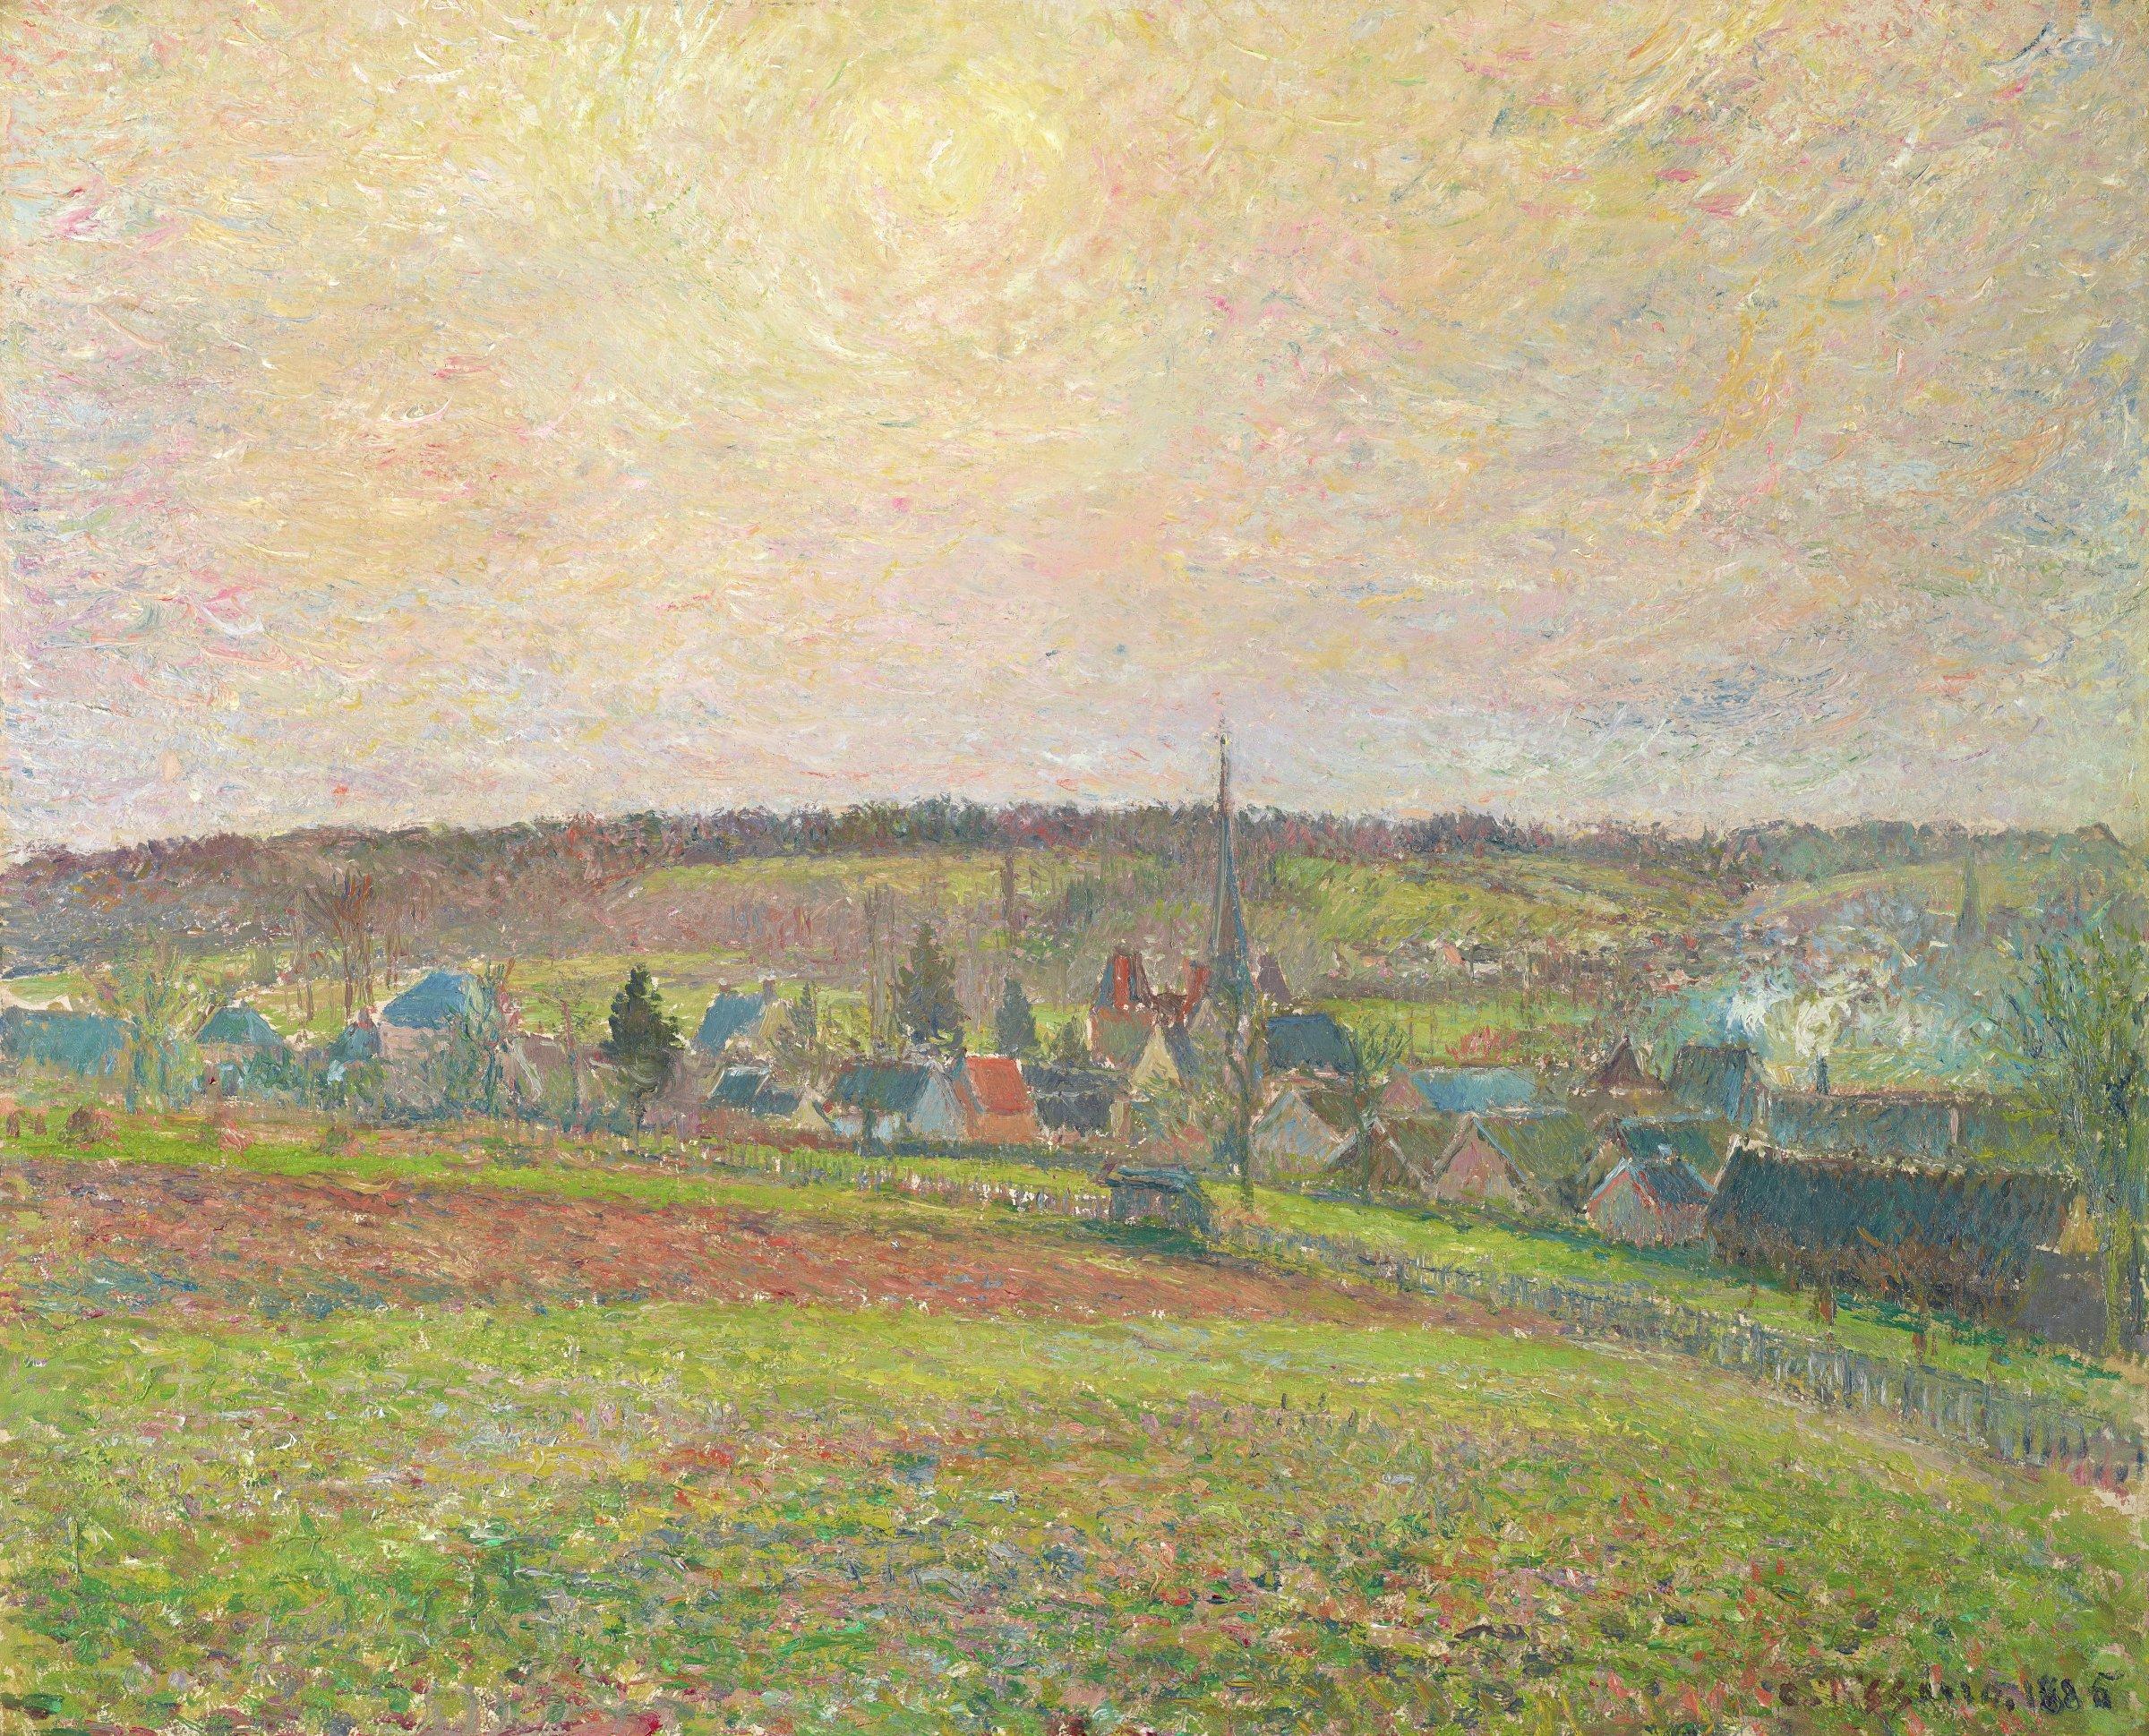 Le Village d'Éragny (The Village of Éragny), Camille Pissarro, oil on canvas